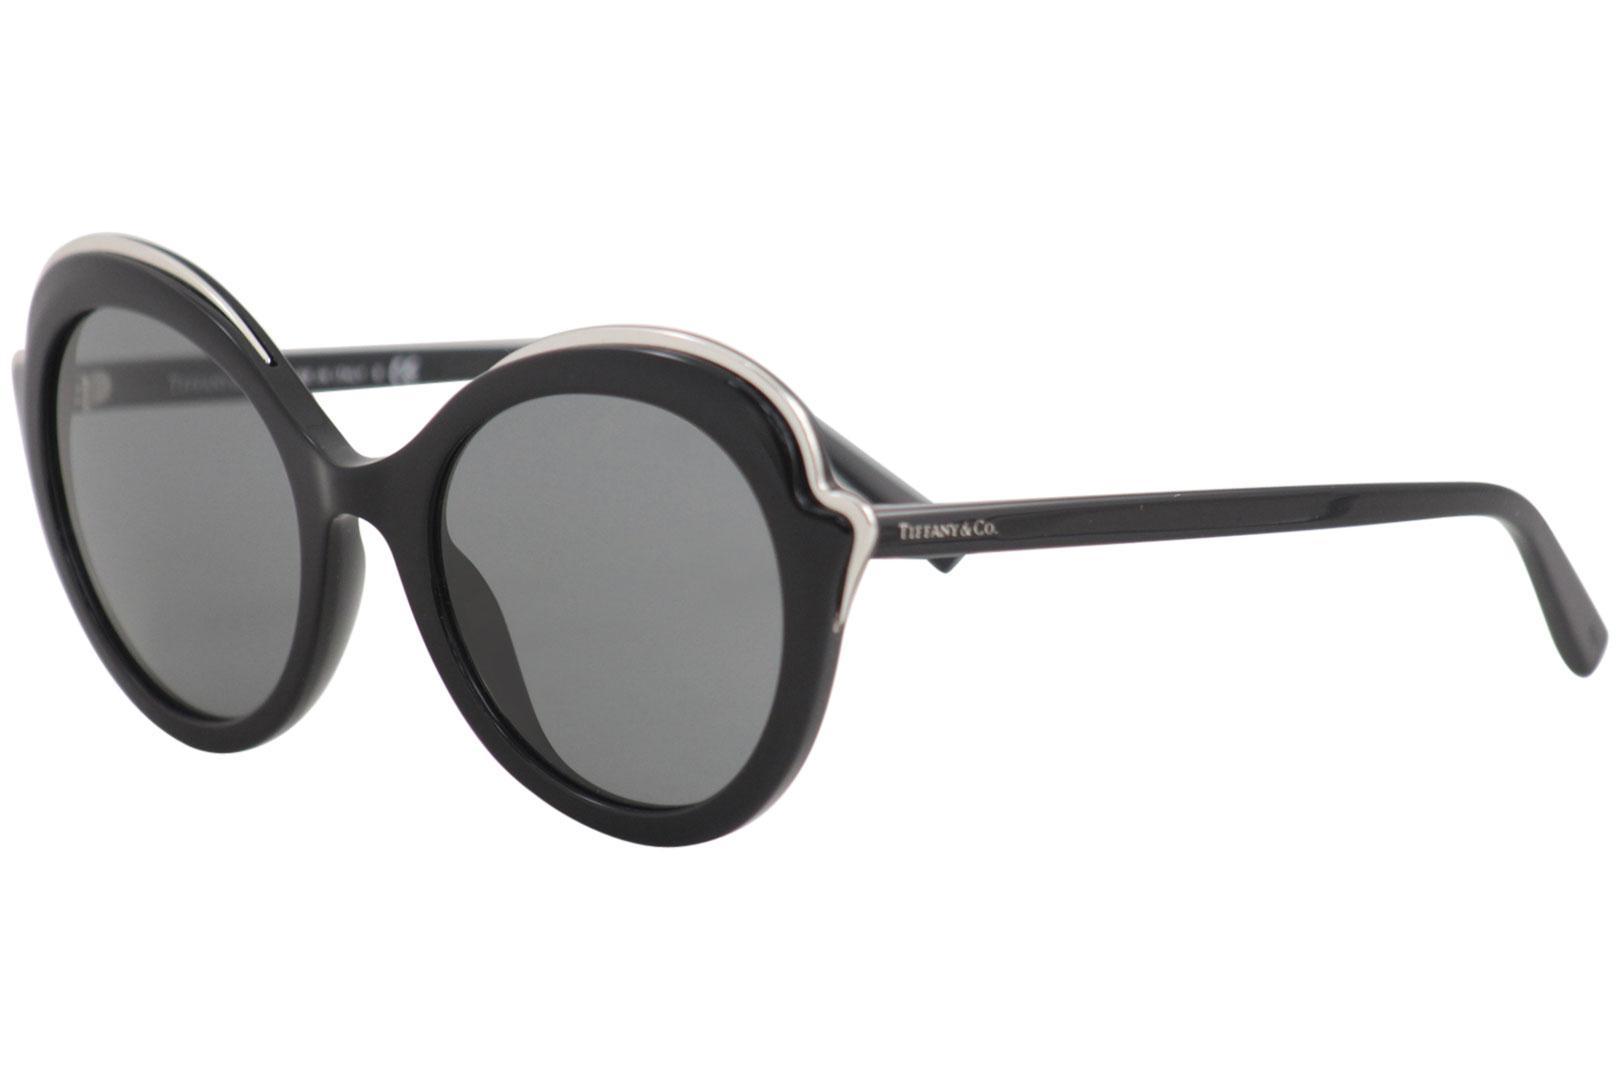 639588c920 Women s TF4155 TF 4155 Fashion Round Sunglasses by Tiffany   Co. 12345